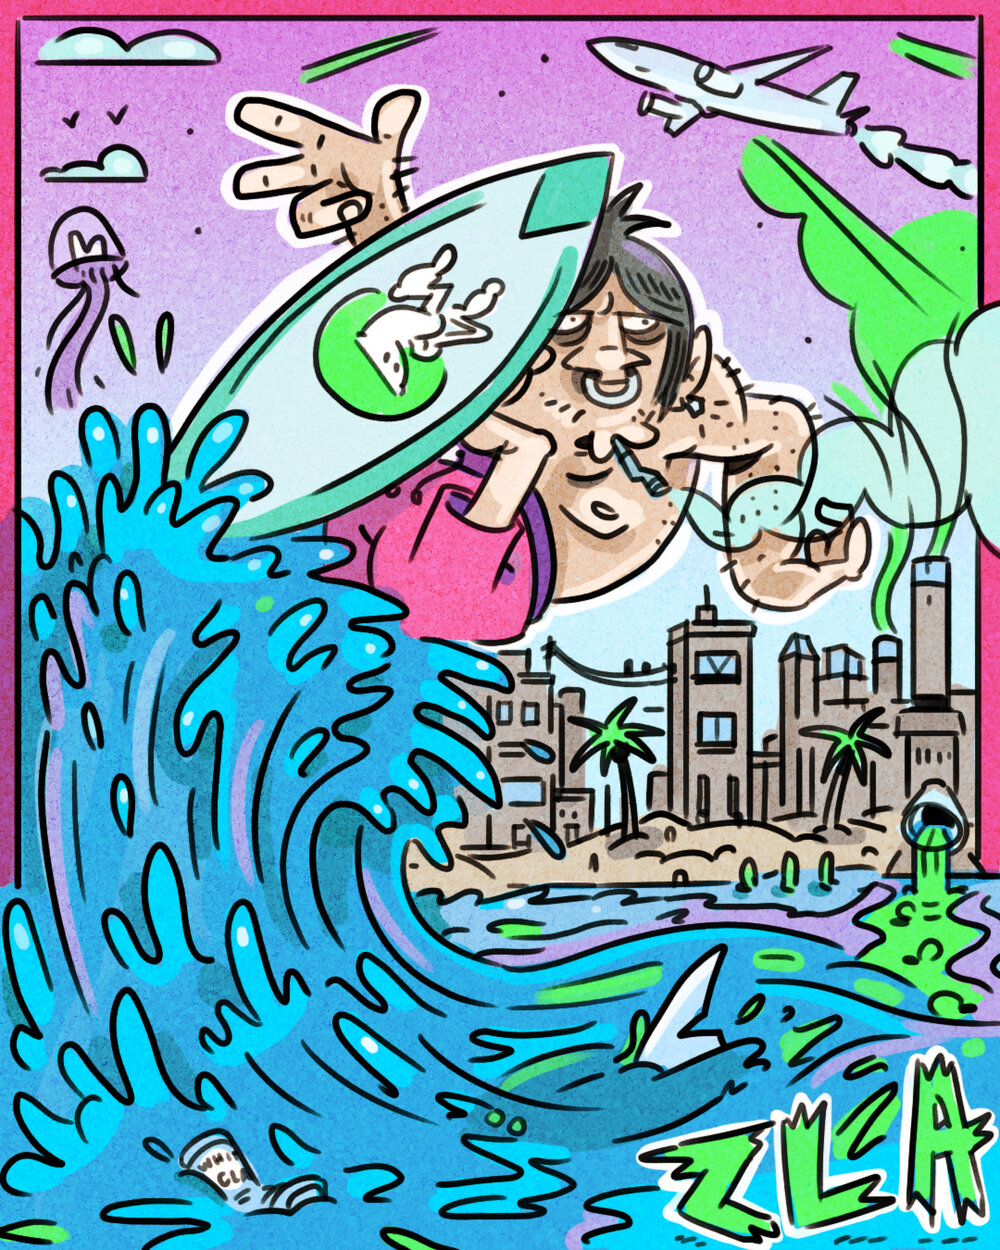 SURFER-DUDE.jpg